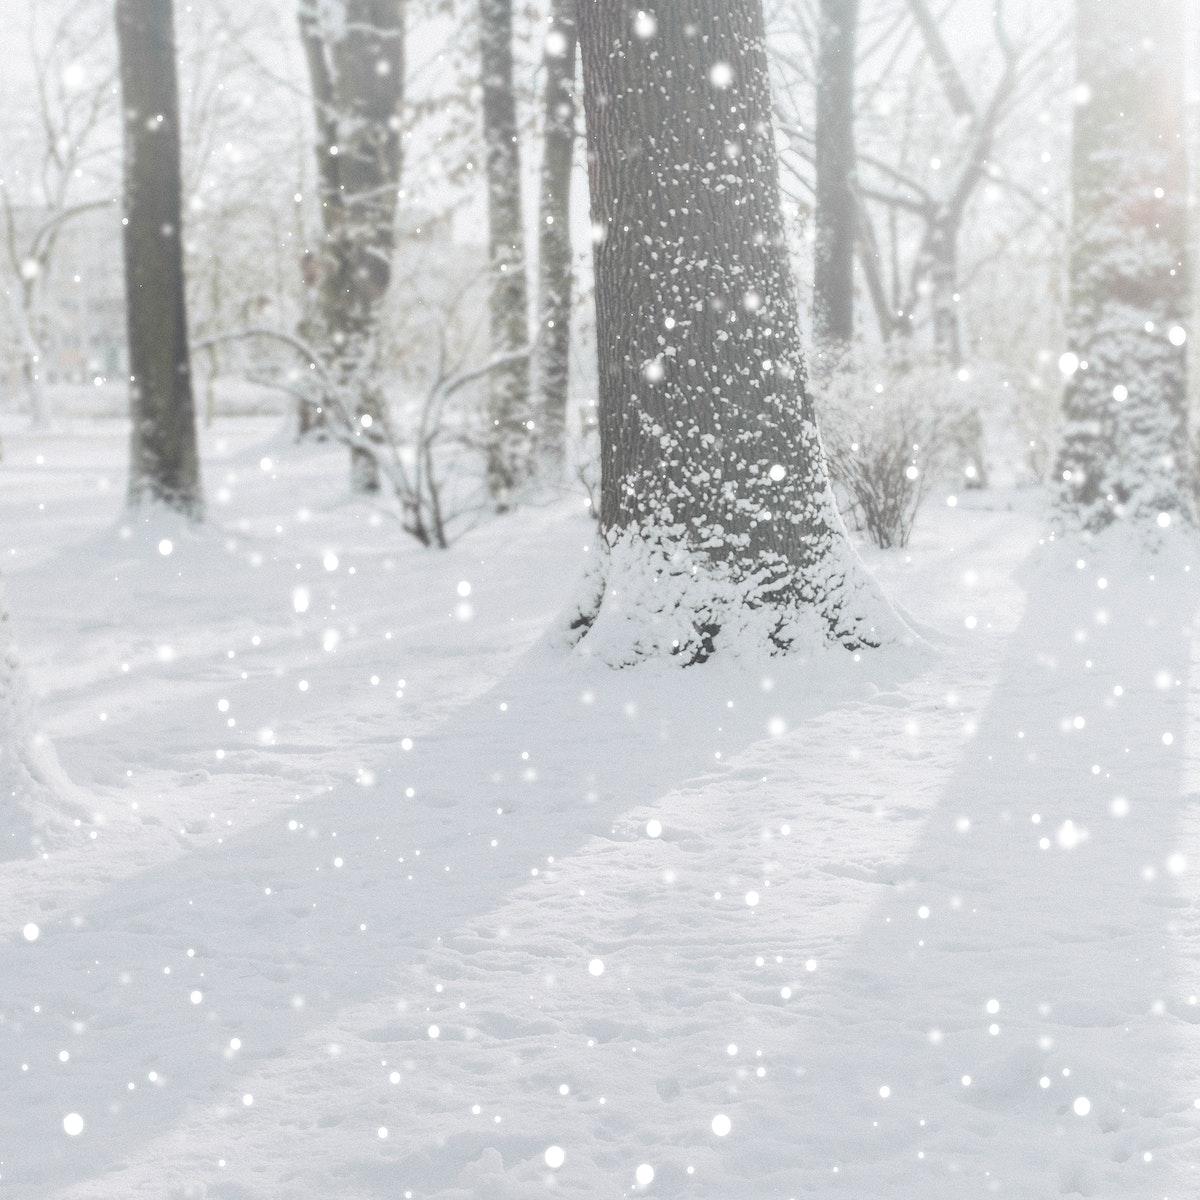 Sunbeam through the snowy forest